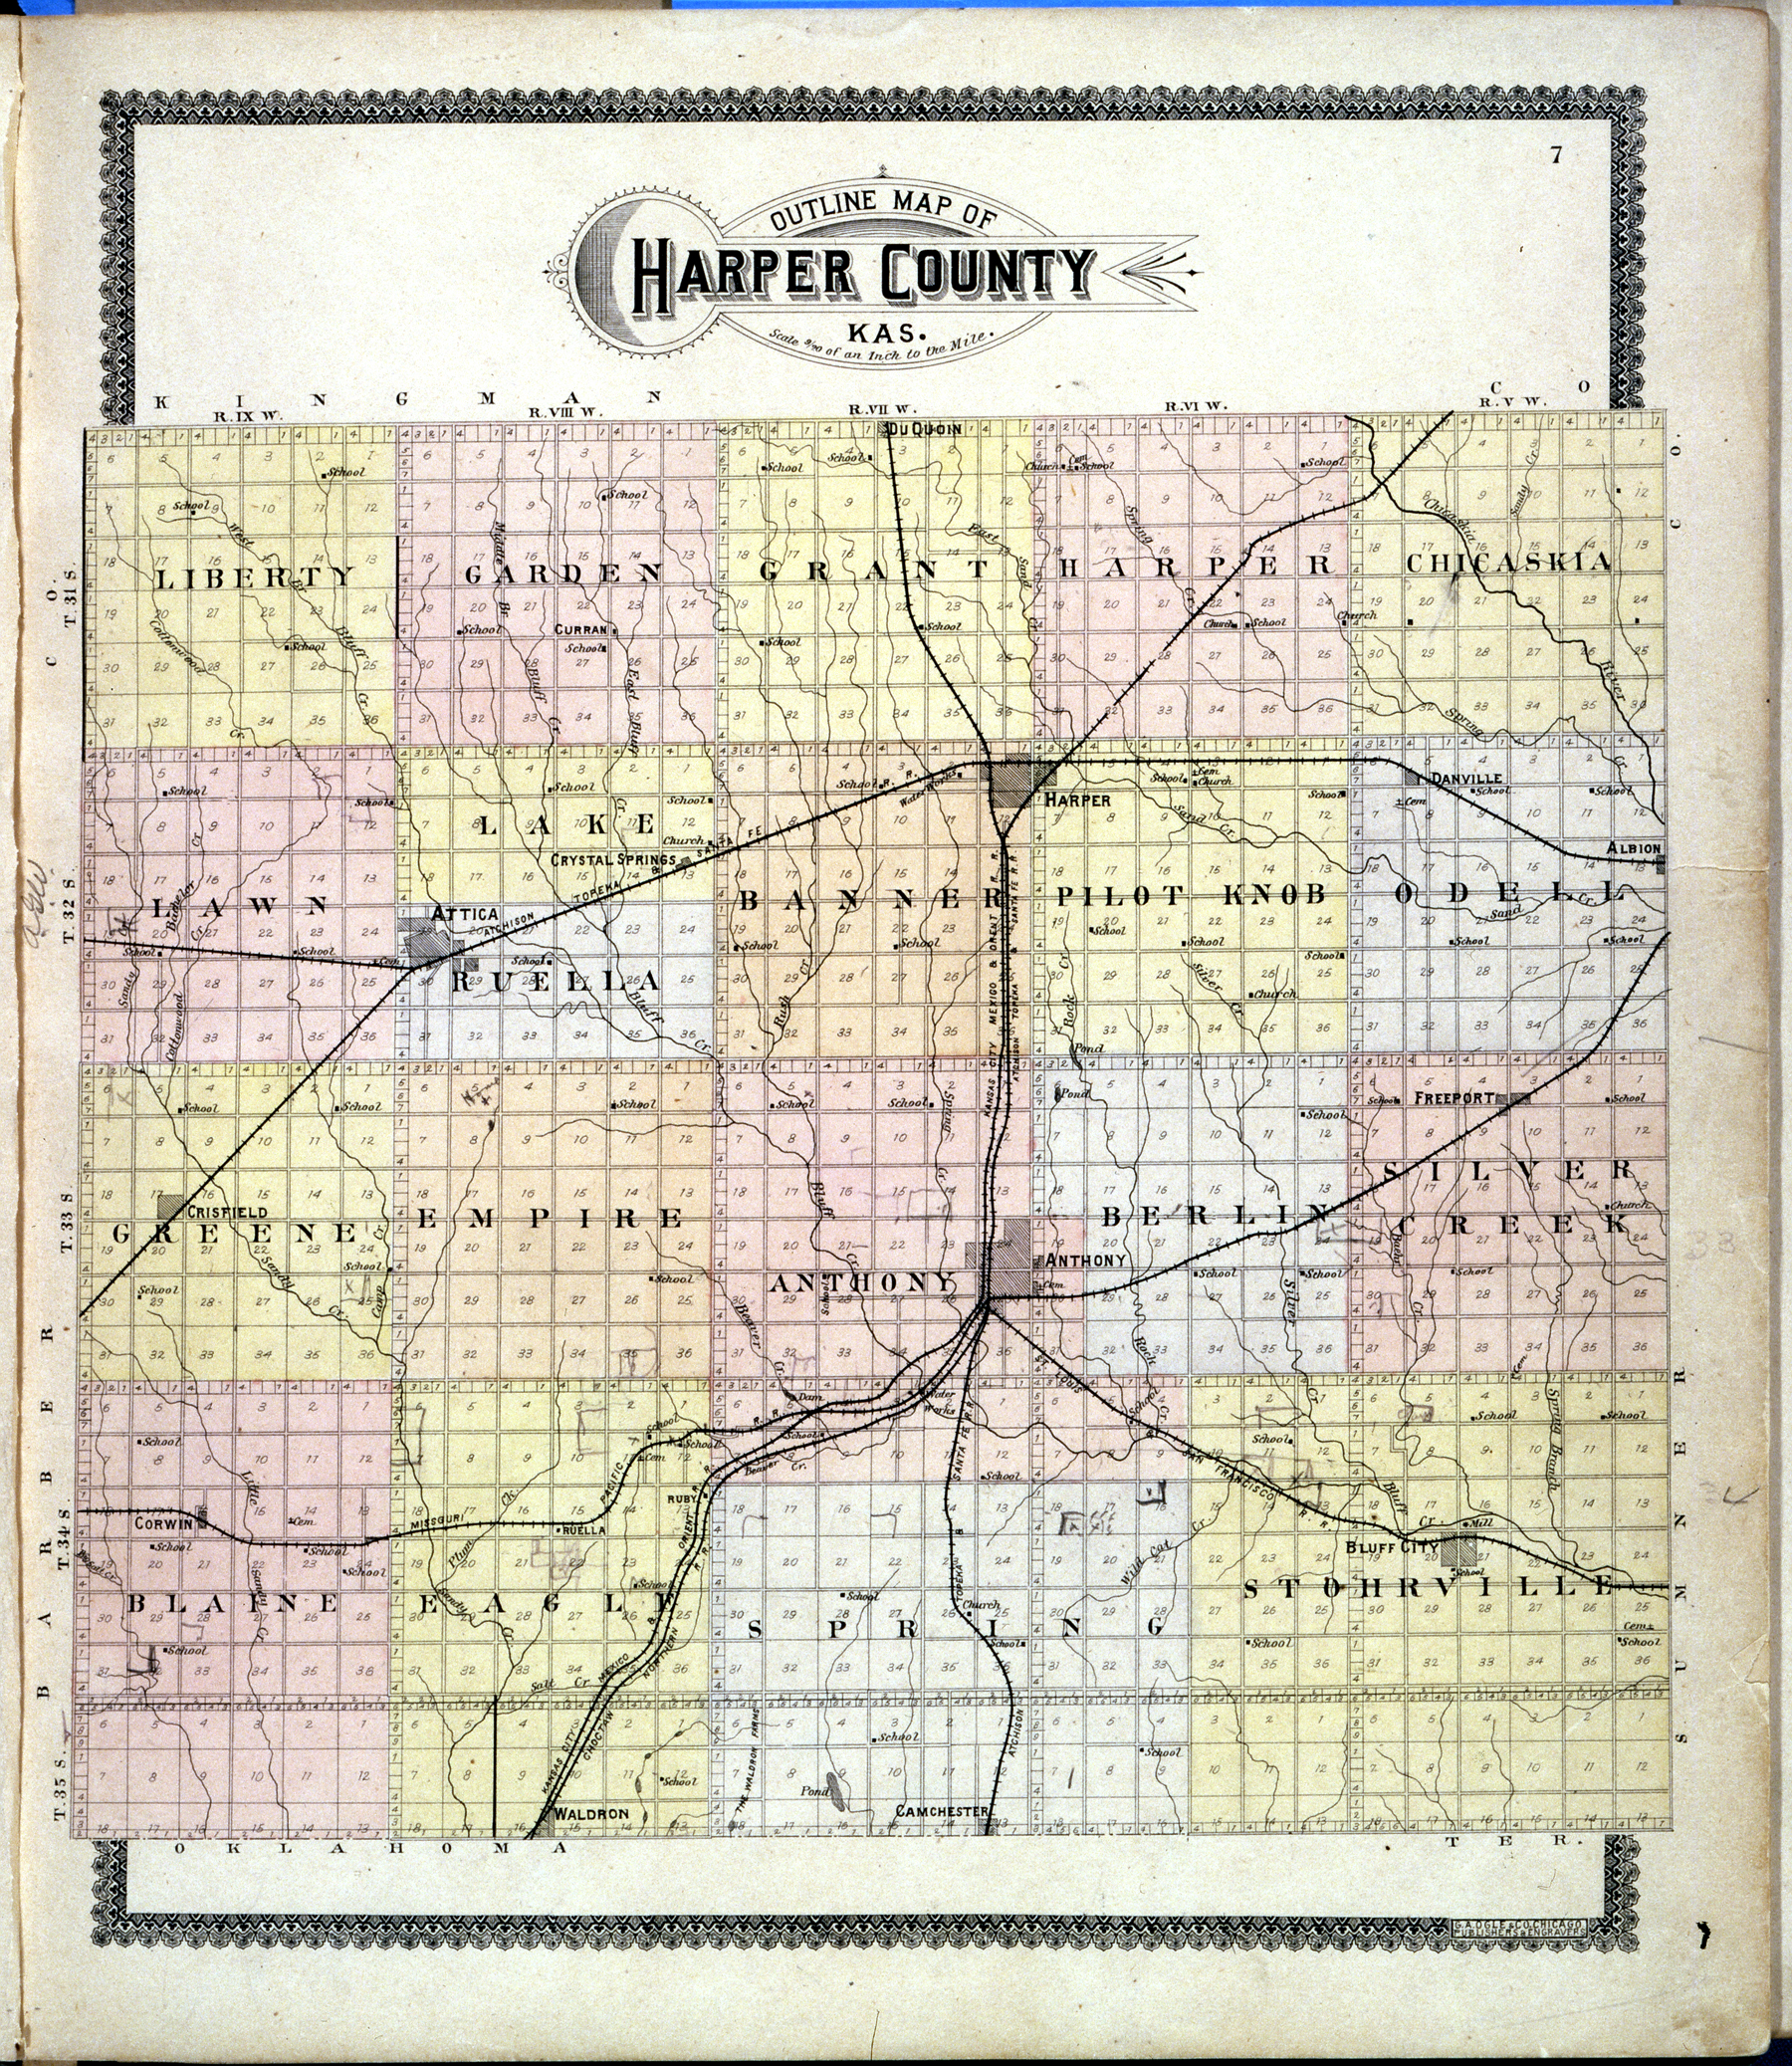 Standard atlas of Harper County, Kansas - 7